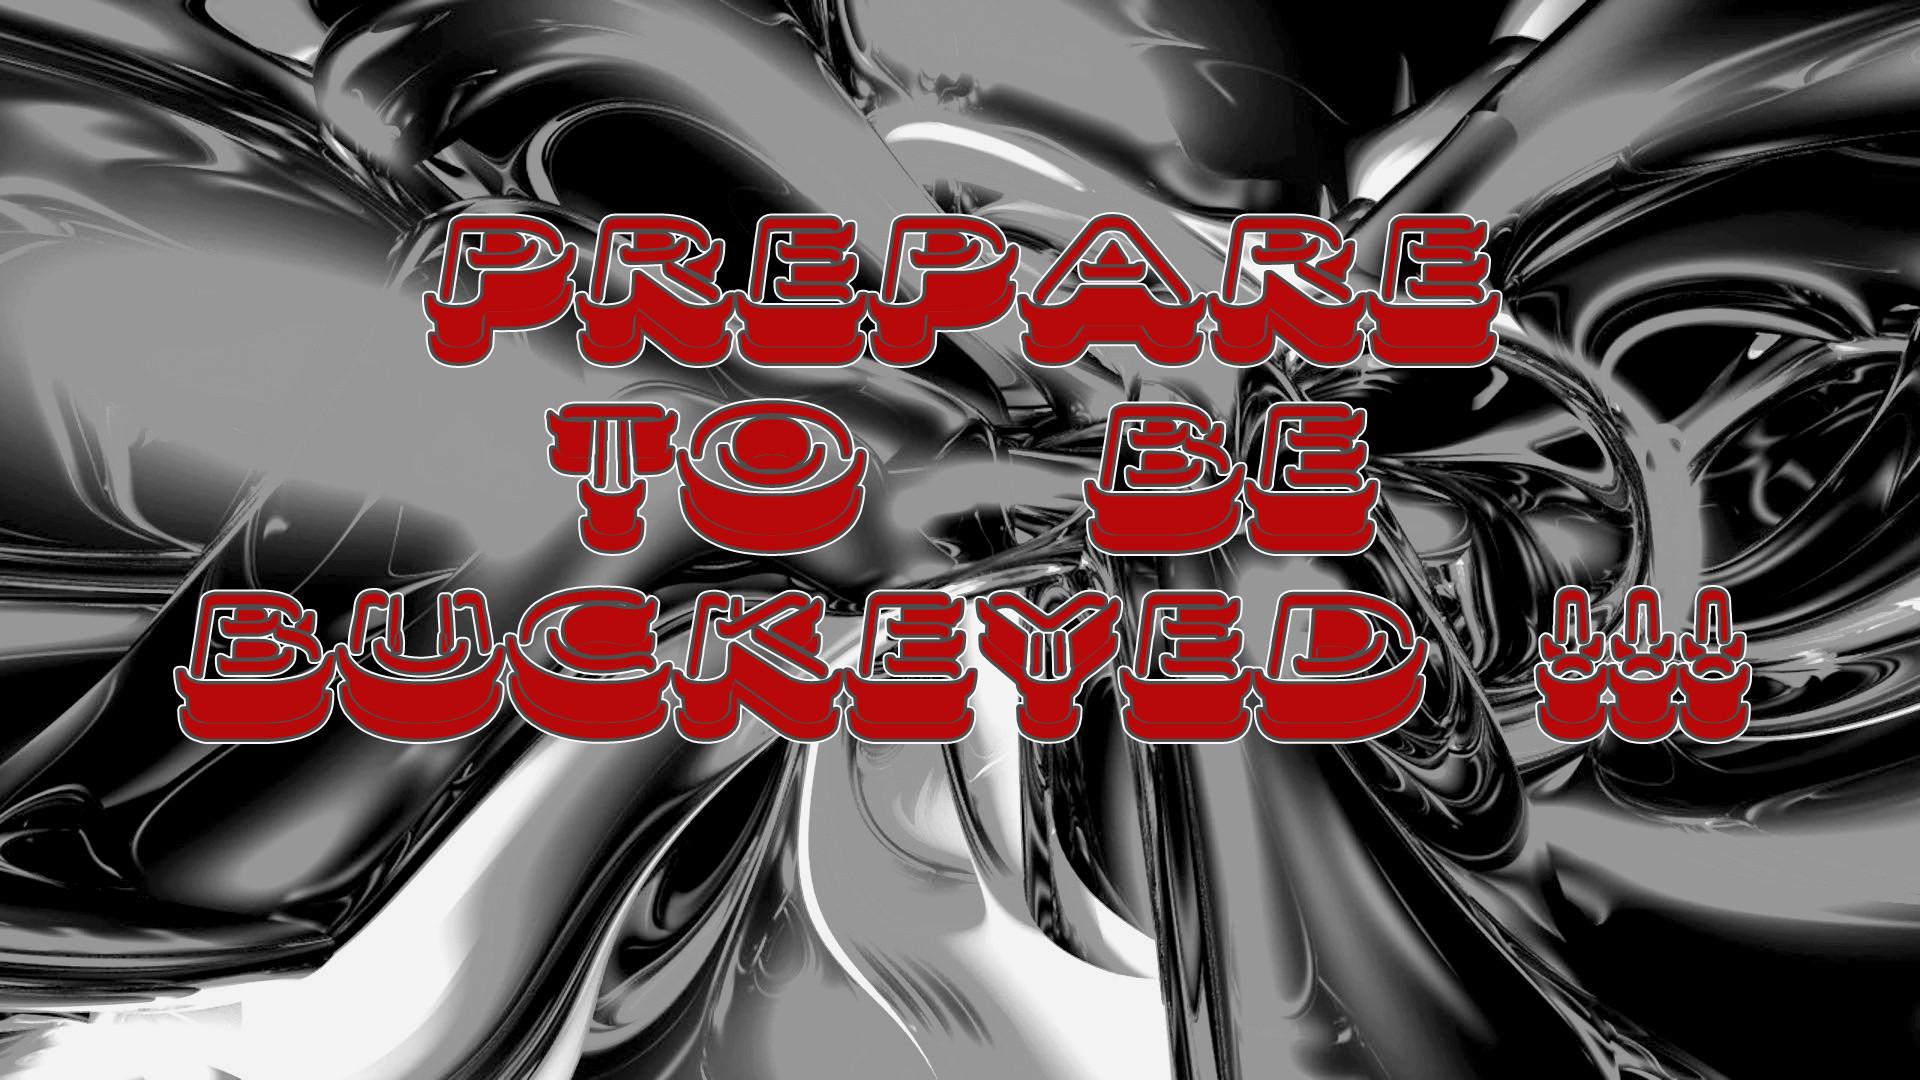 PREPARE TO BE BUCKEYED